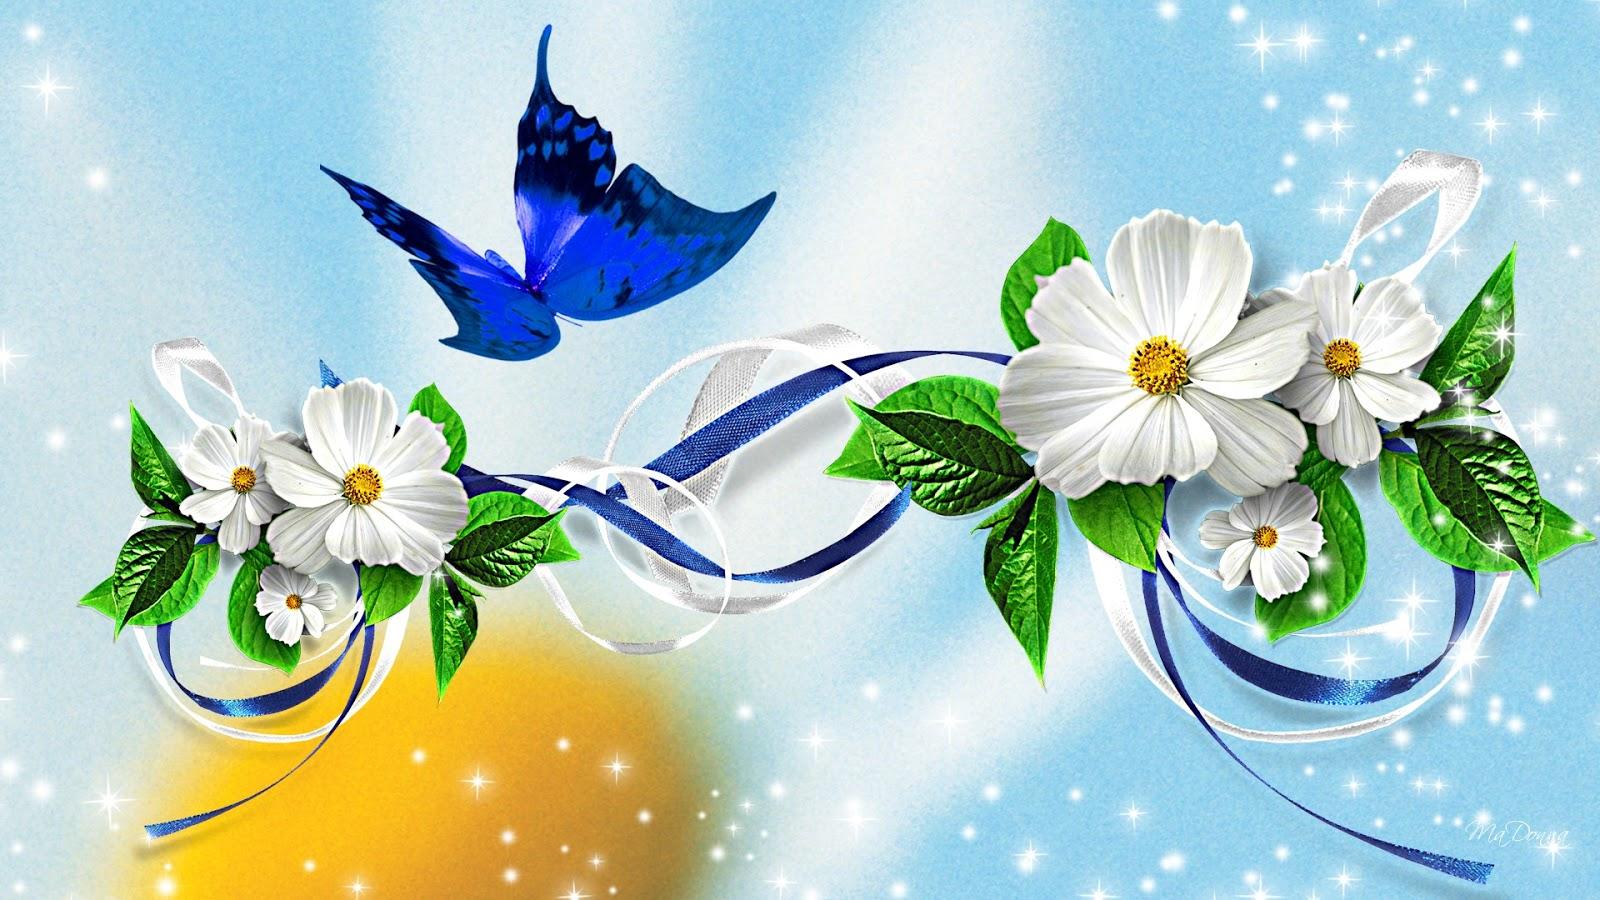 imageslist com wallpapers with butterflies 1